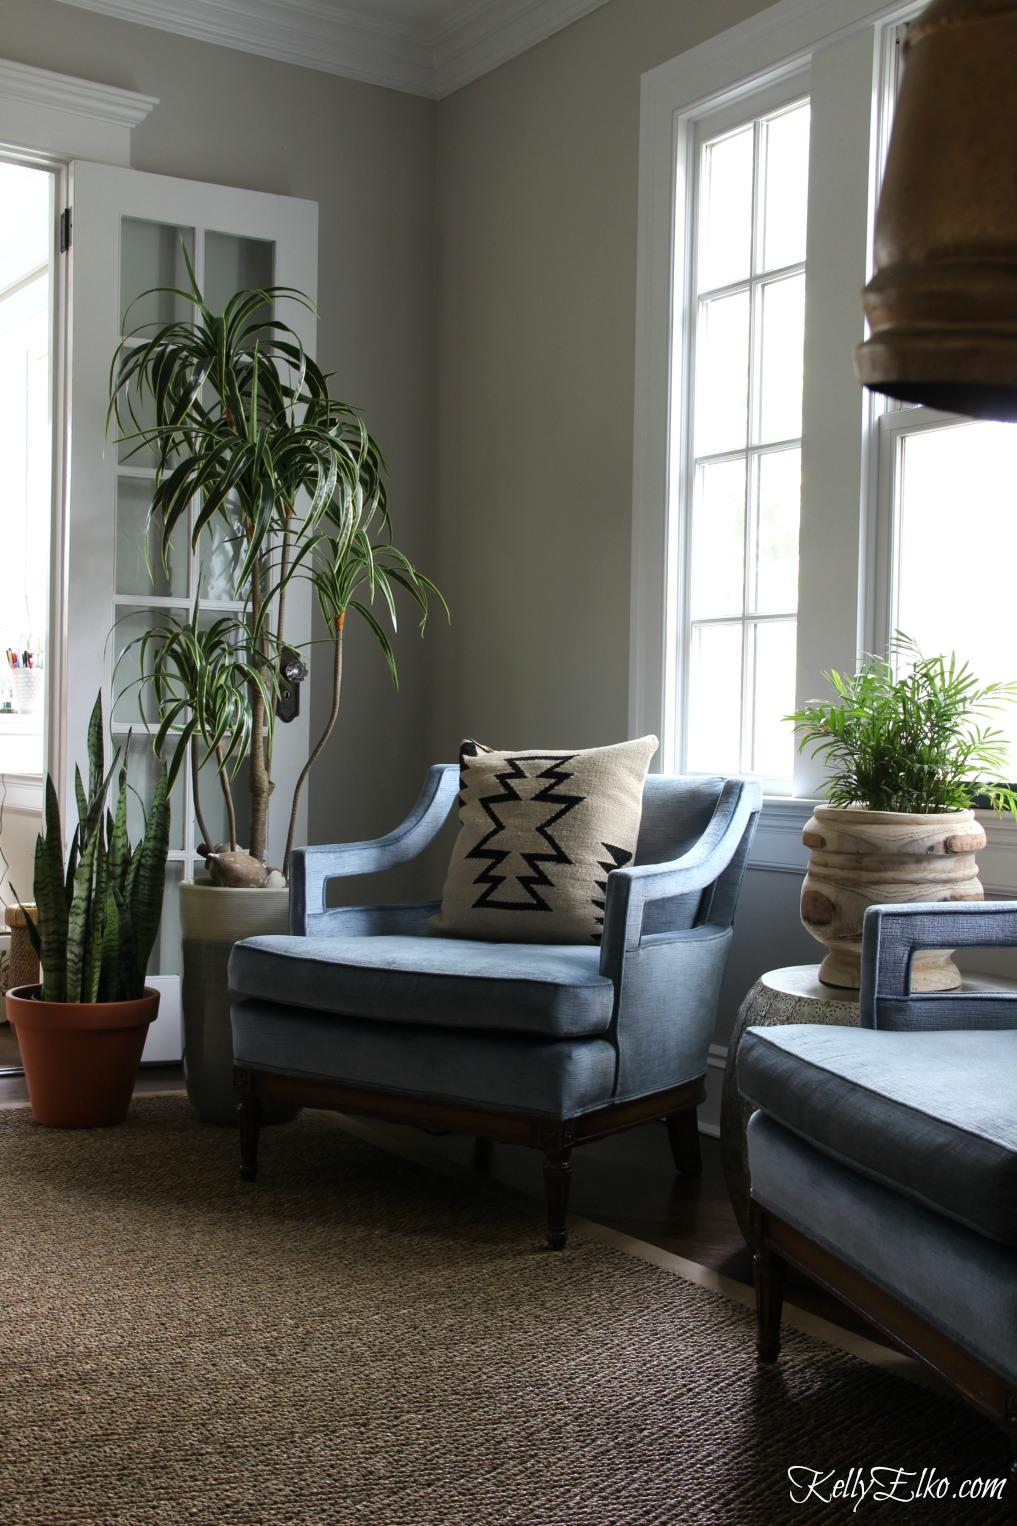 Vintage mid century modern blue club chairs kellyelko.com